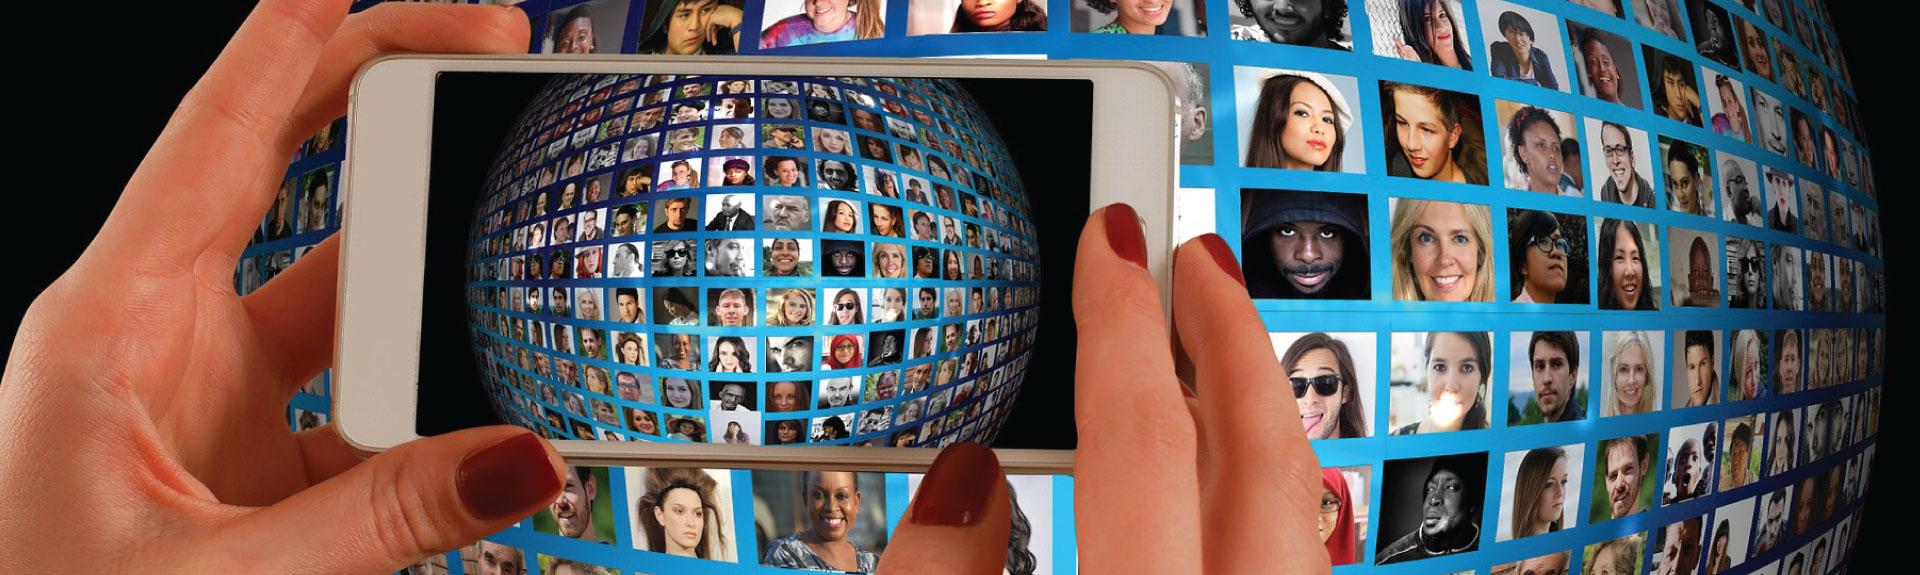 Community Management: Global o Local?